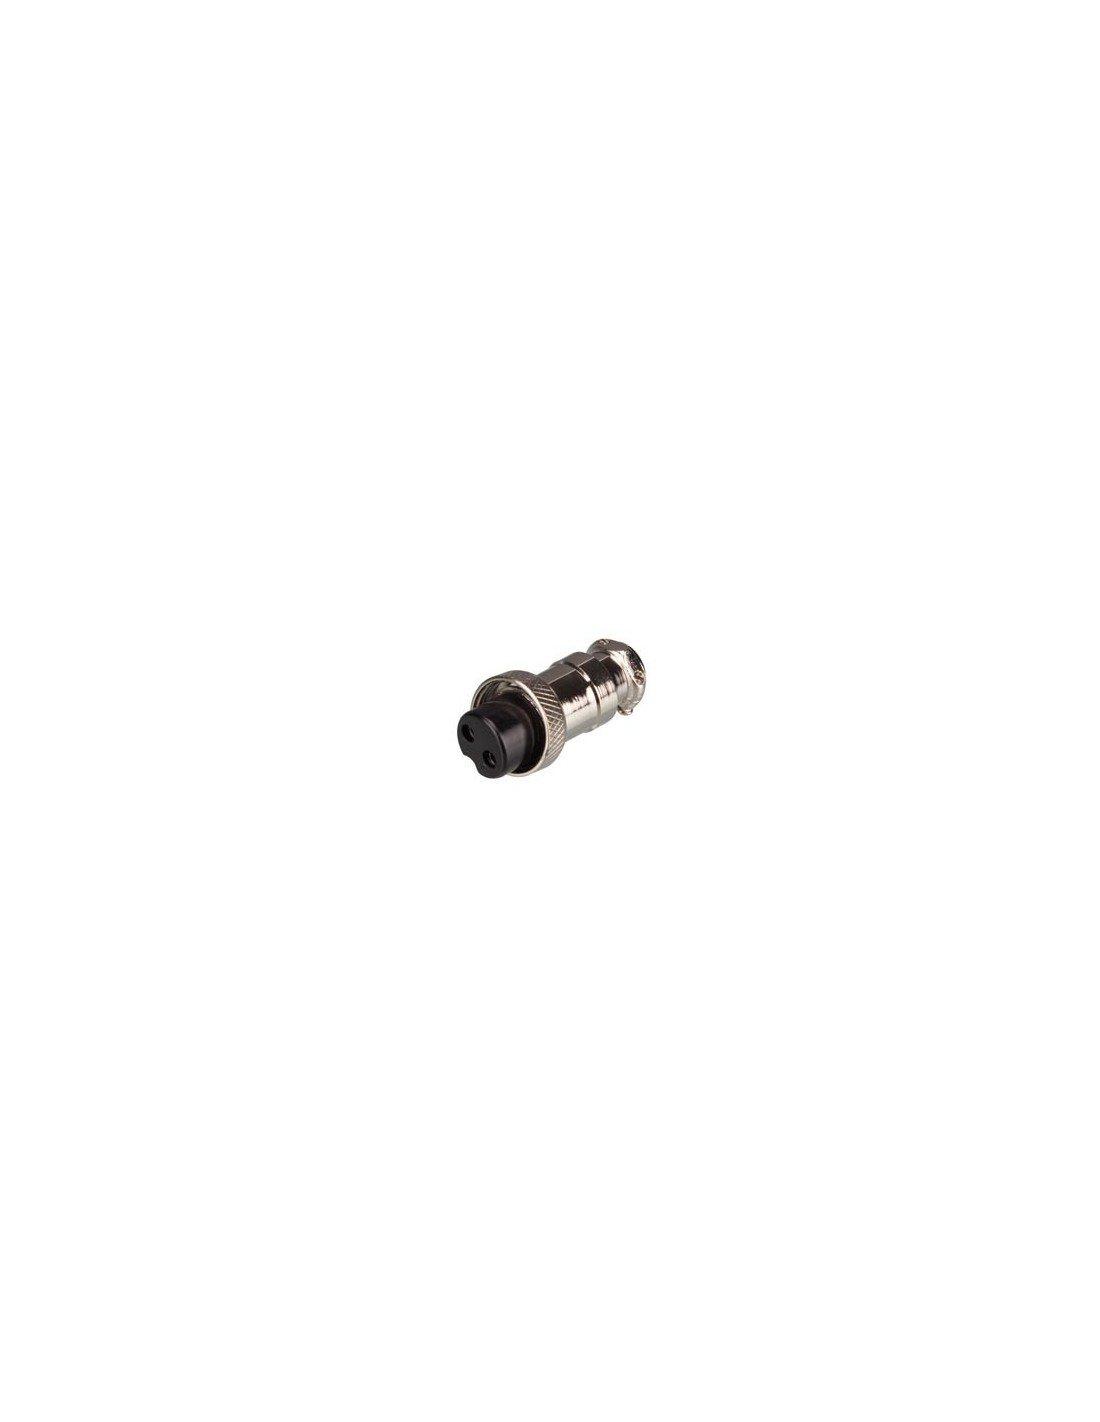 Perel 141484 Schraub-Kupplung, 2 Polig VS Electronic Vertriebs GmbH